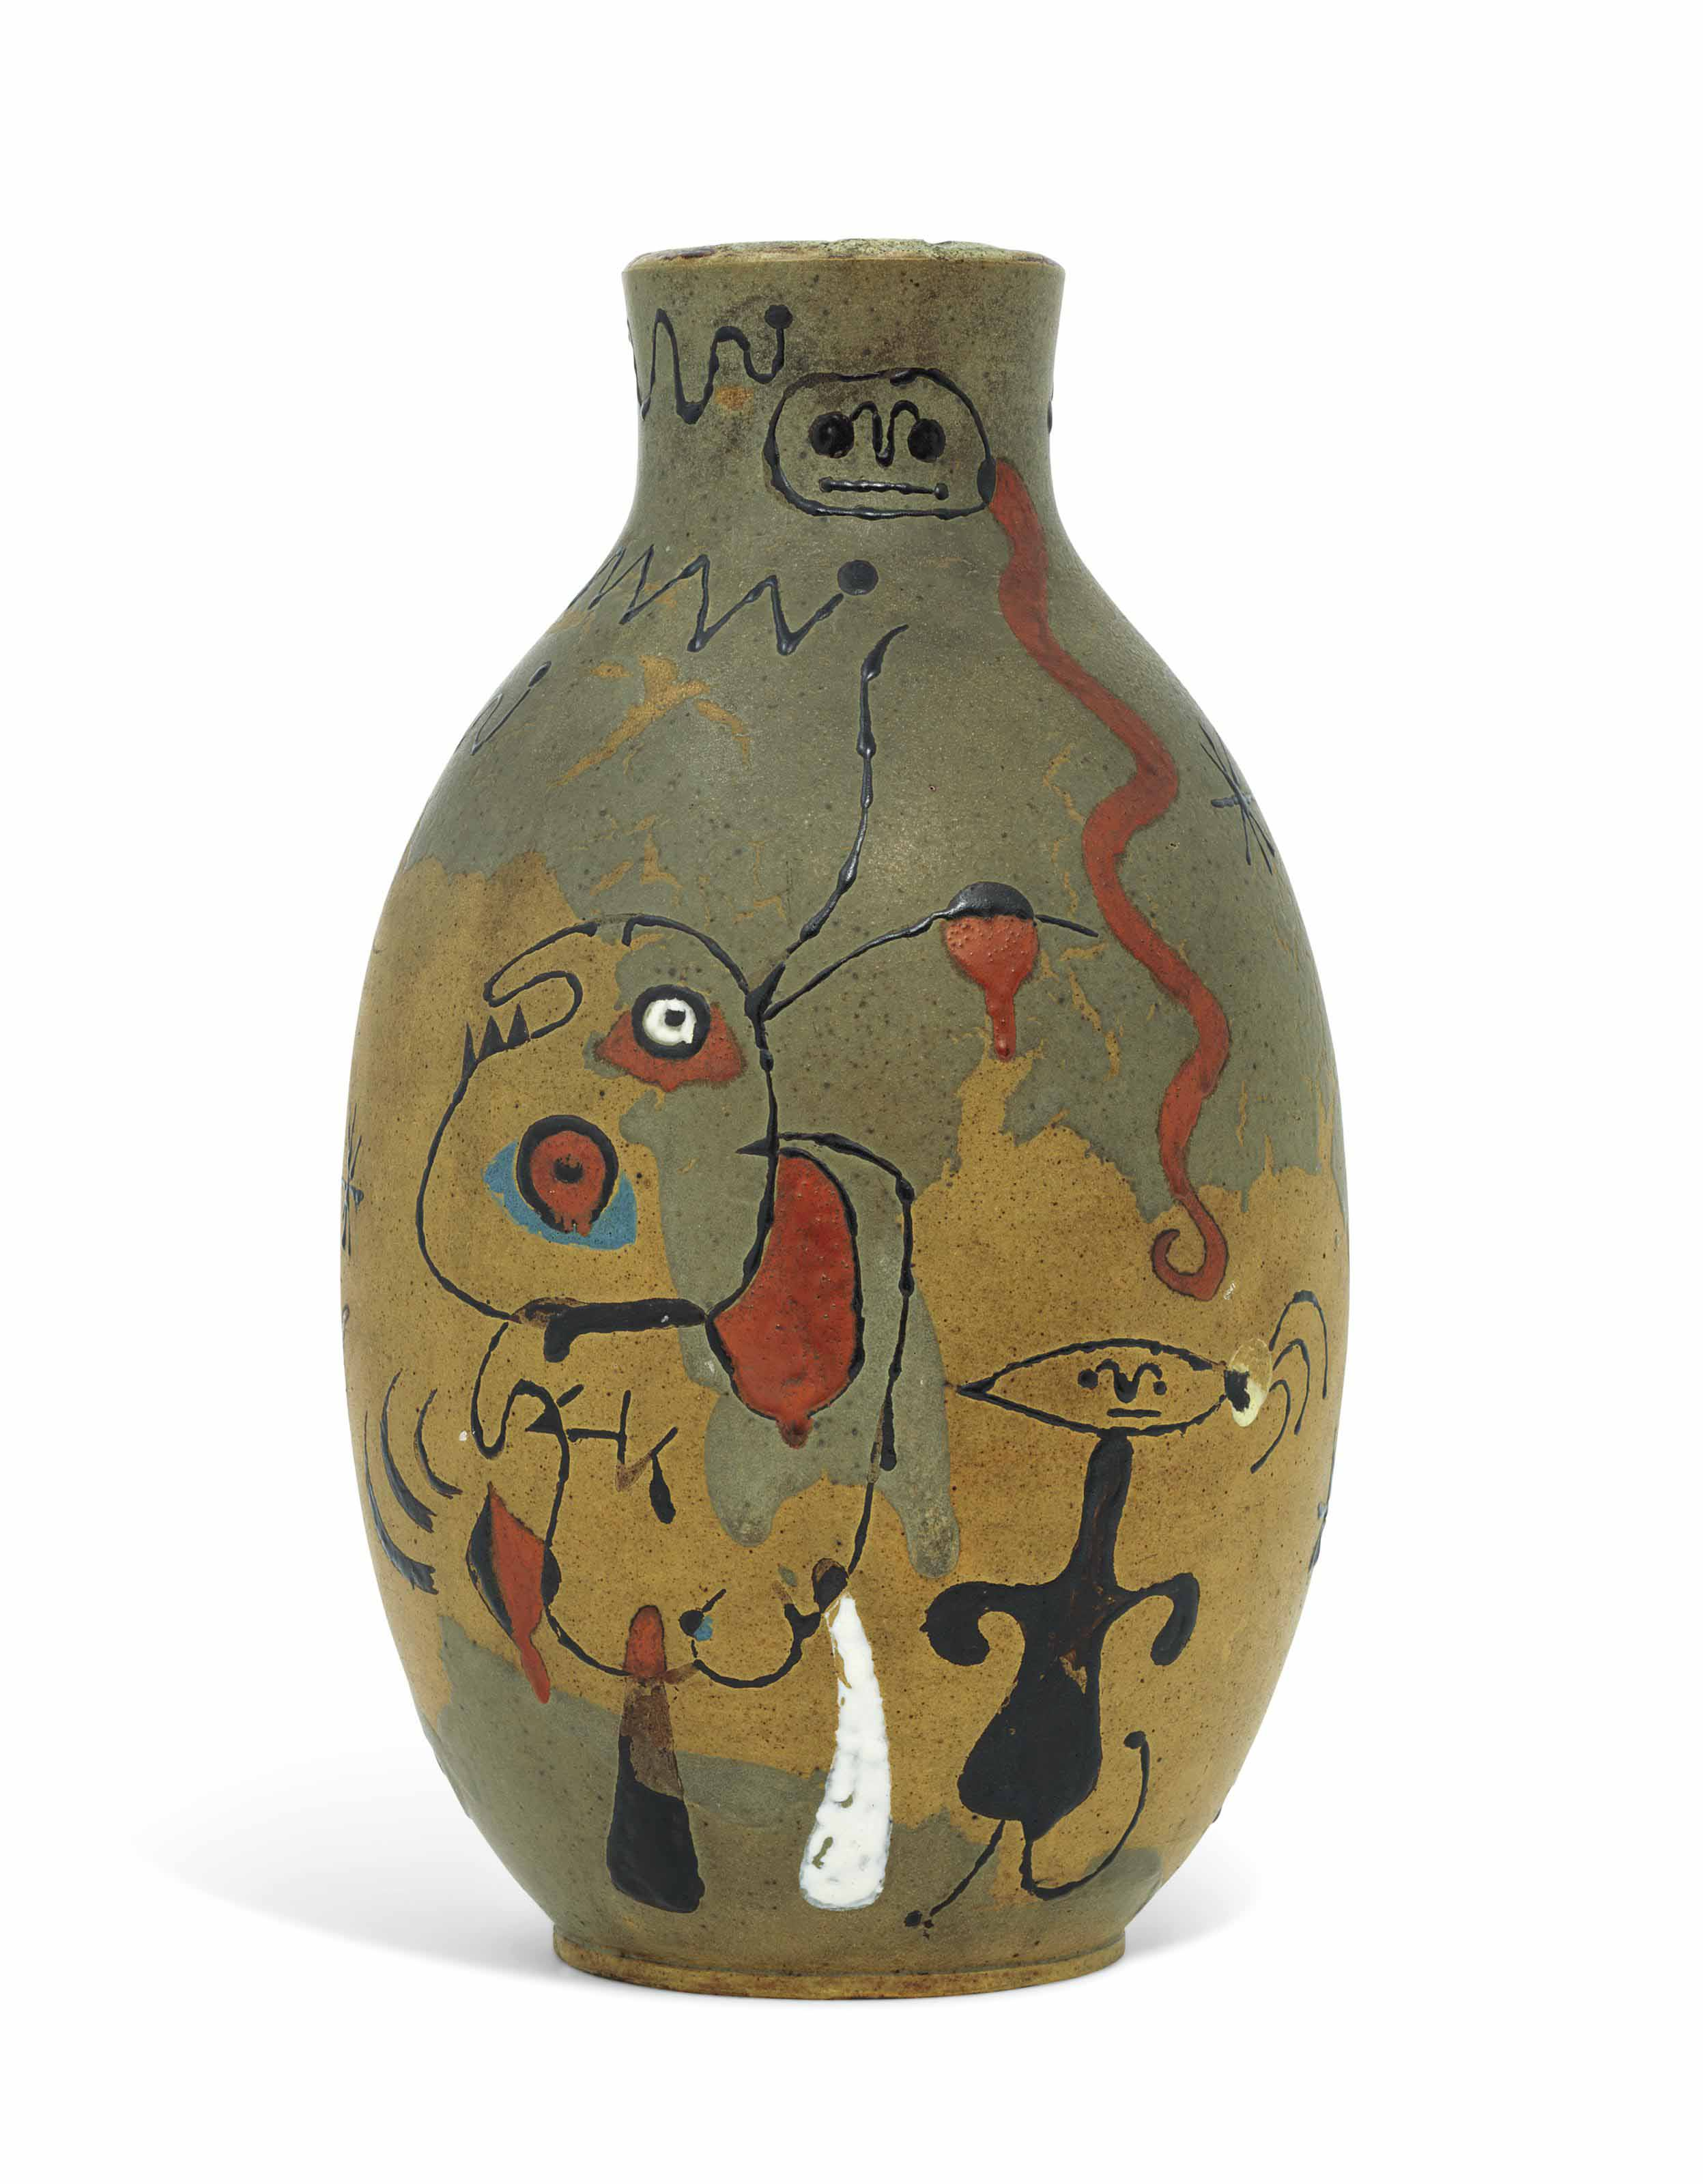 Joan Miro (1893-1983) and Josep Llorens Artigas (1892-1980)